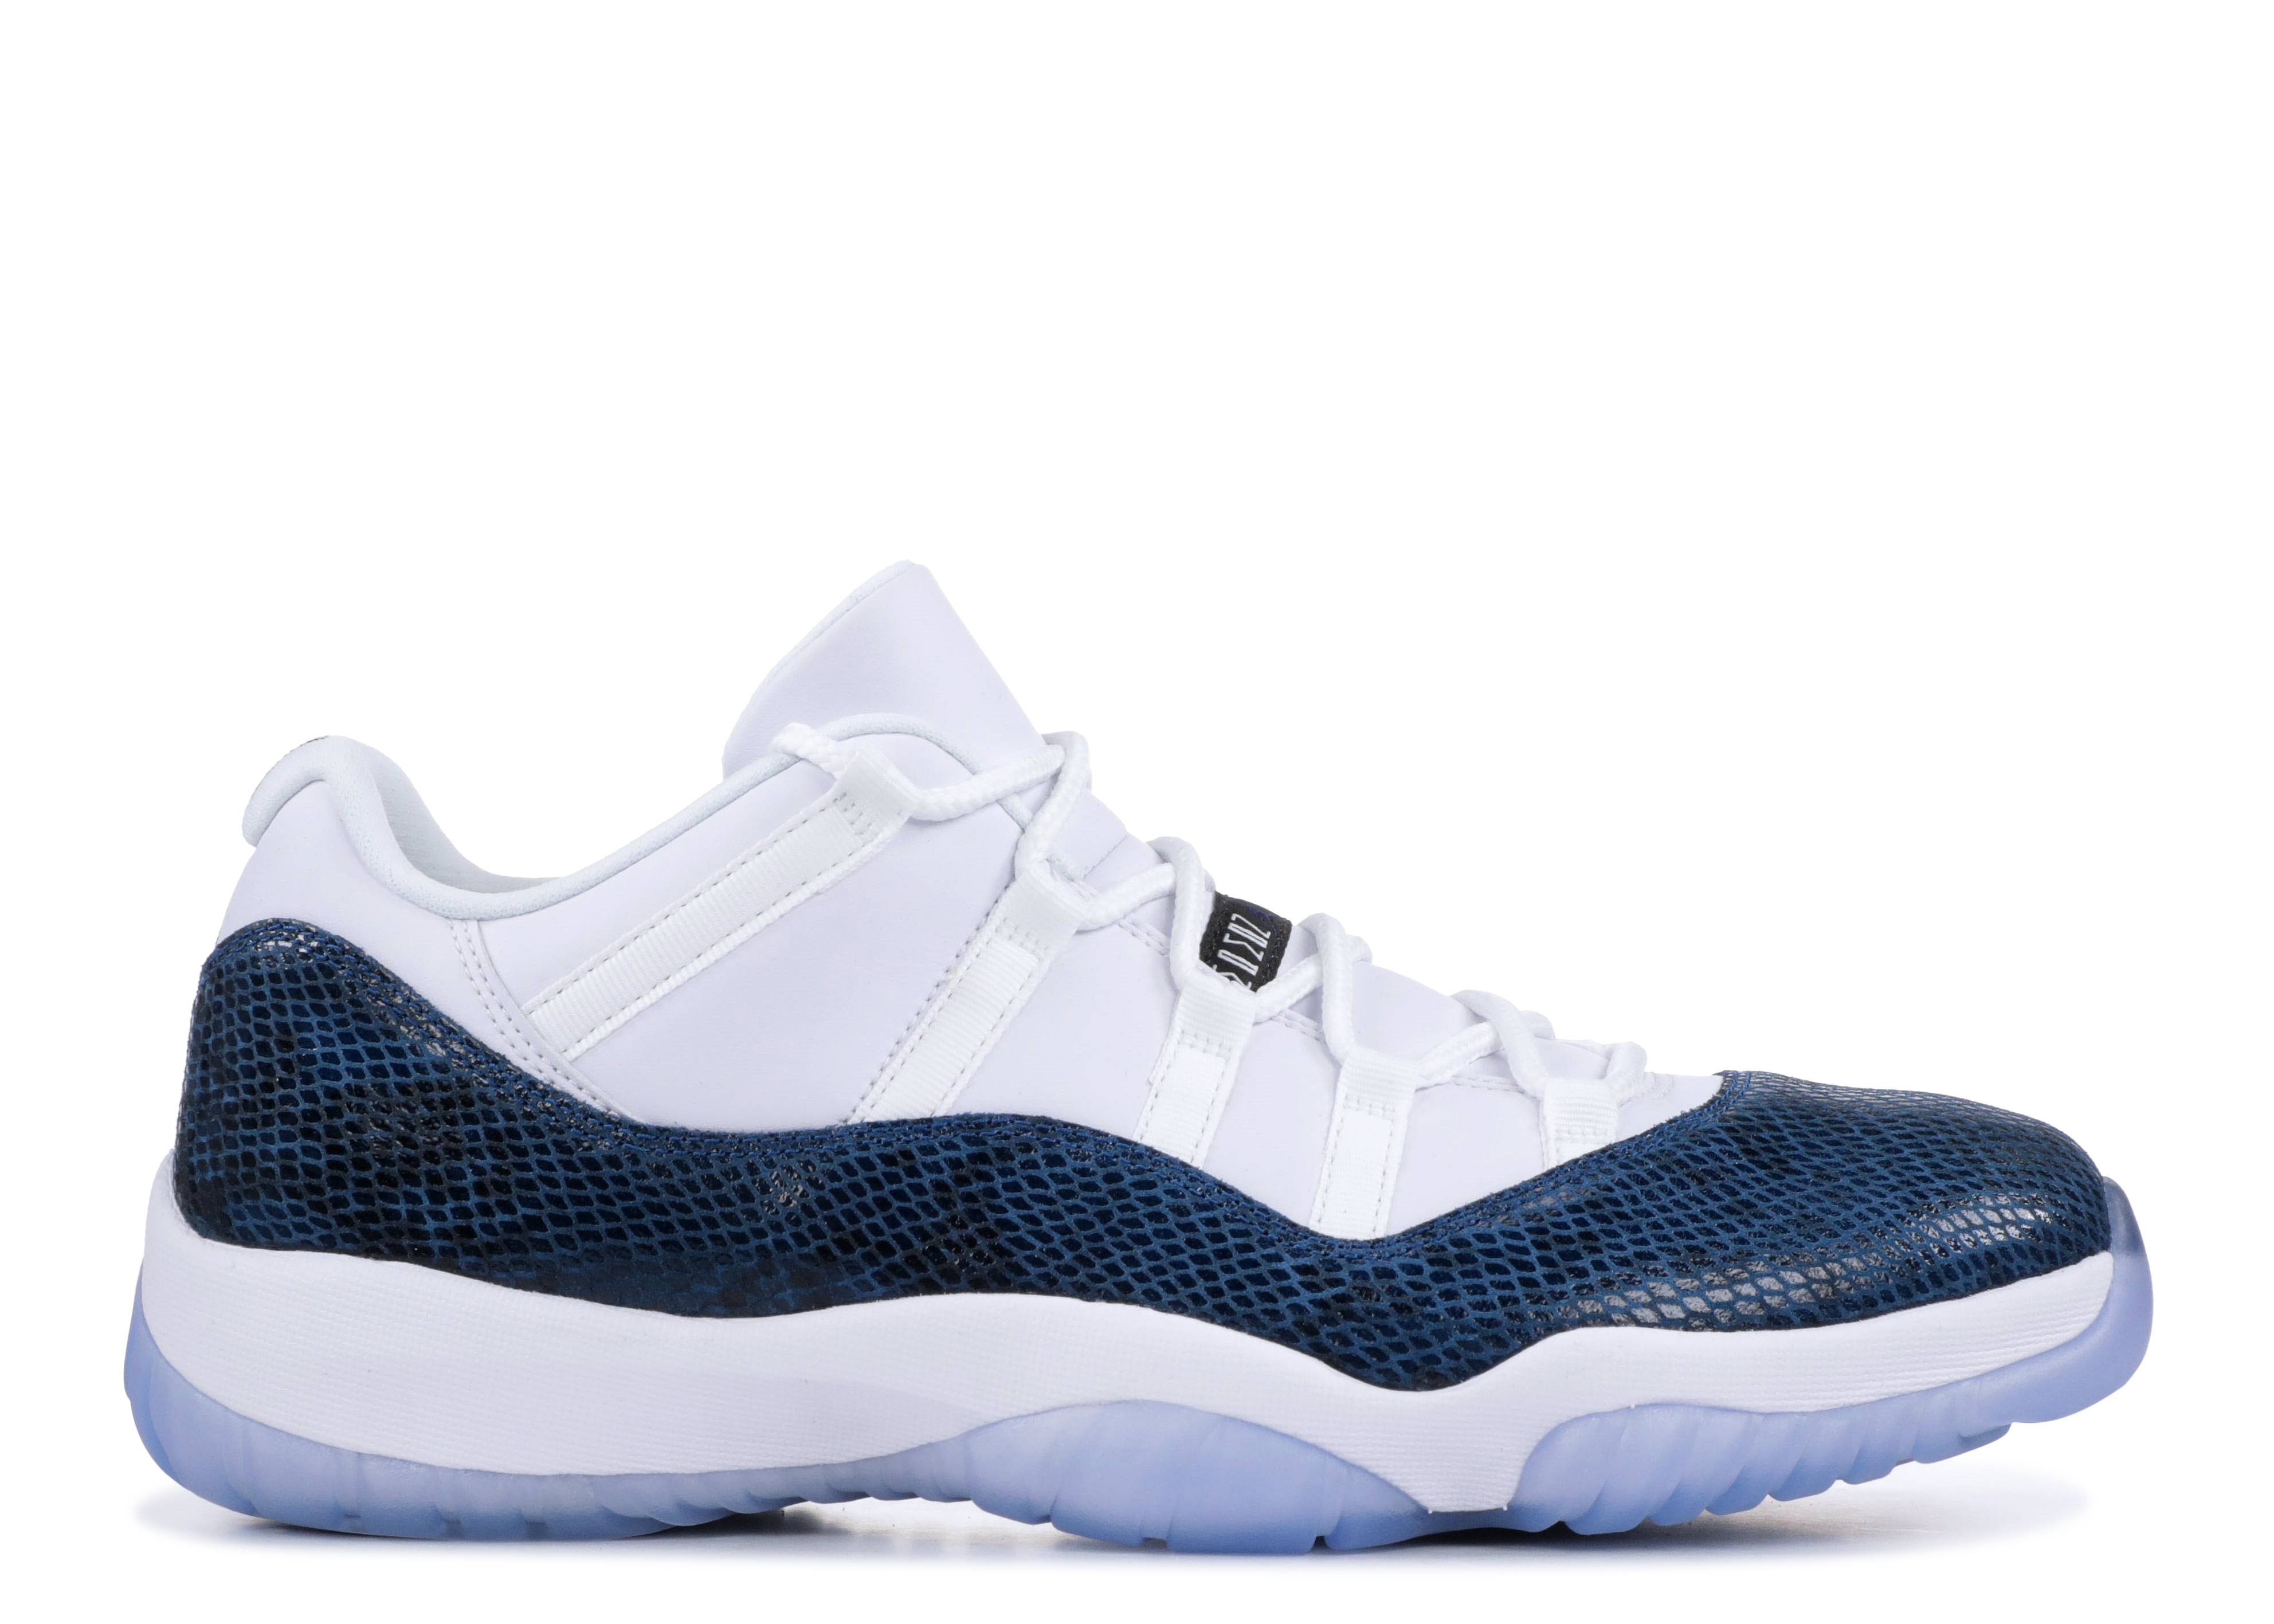 fashion style new photos the best Air Jordan 11 (XI) Shoes - Nike | Flight Club